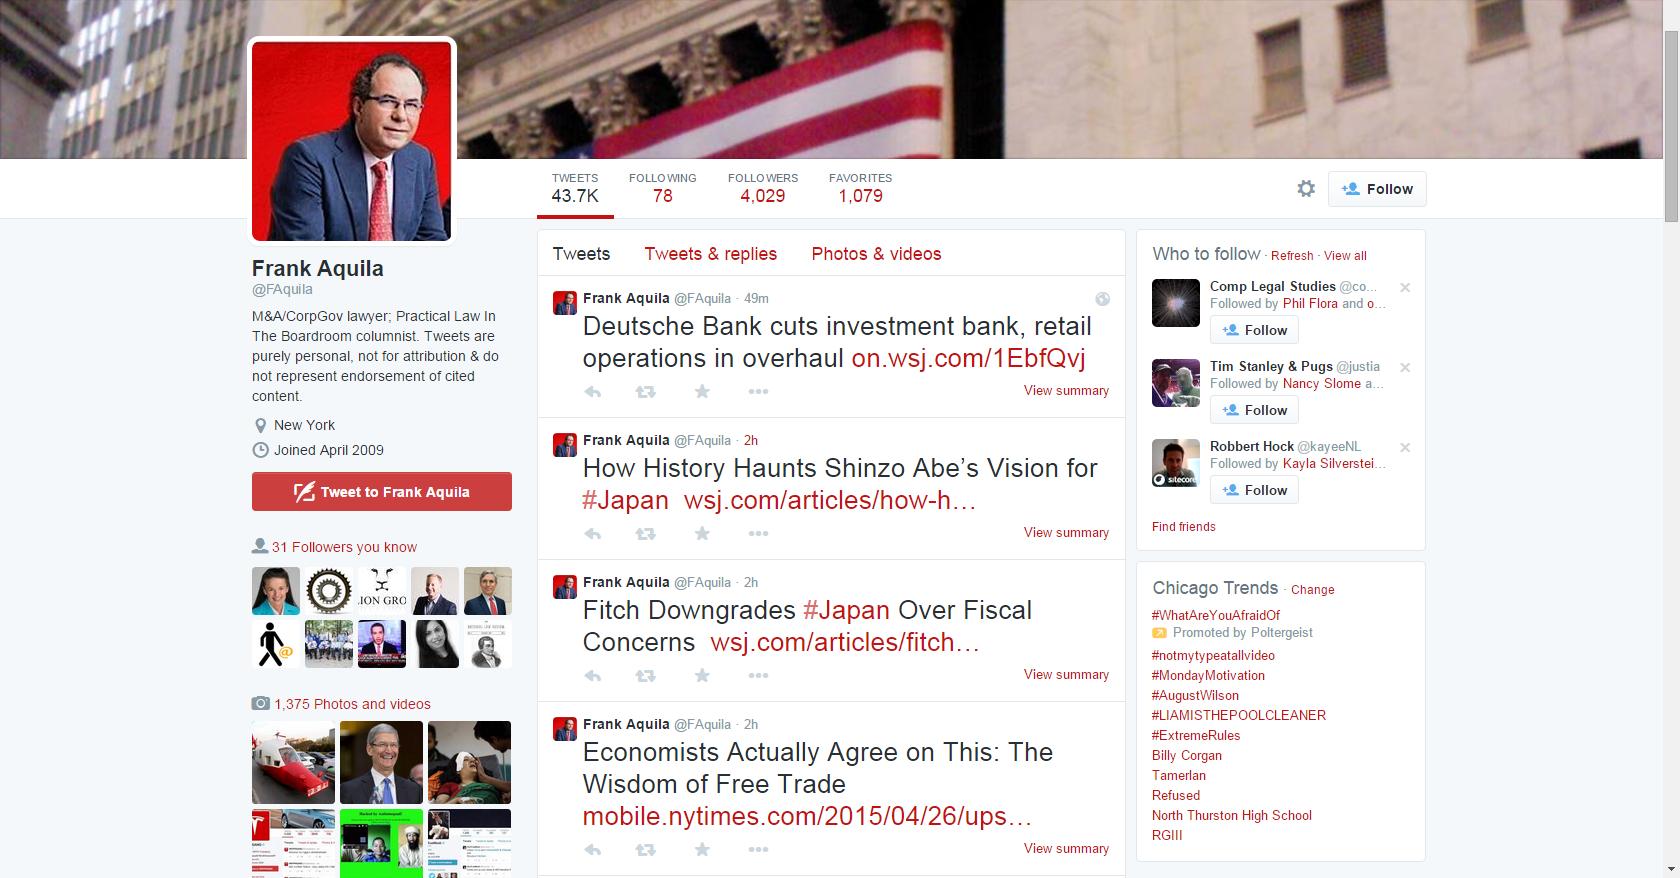 Frank Aquila's Twitter Profile